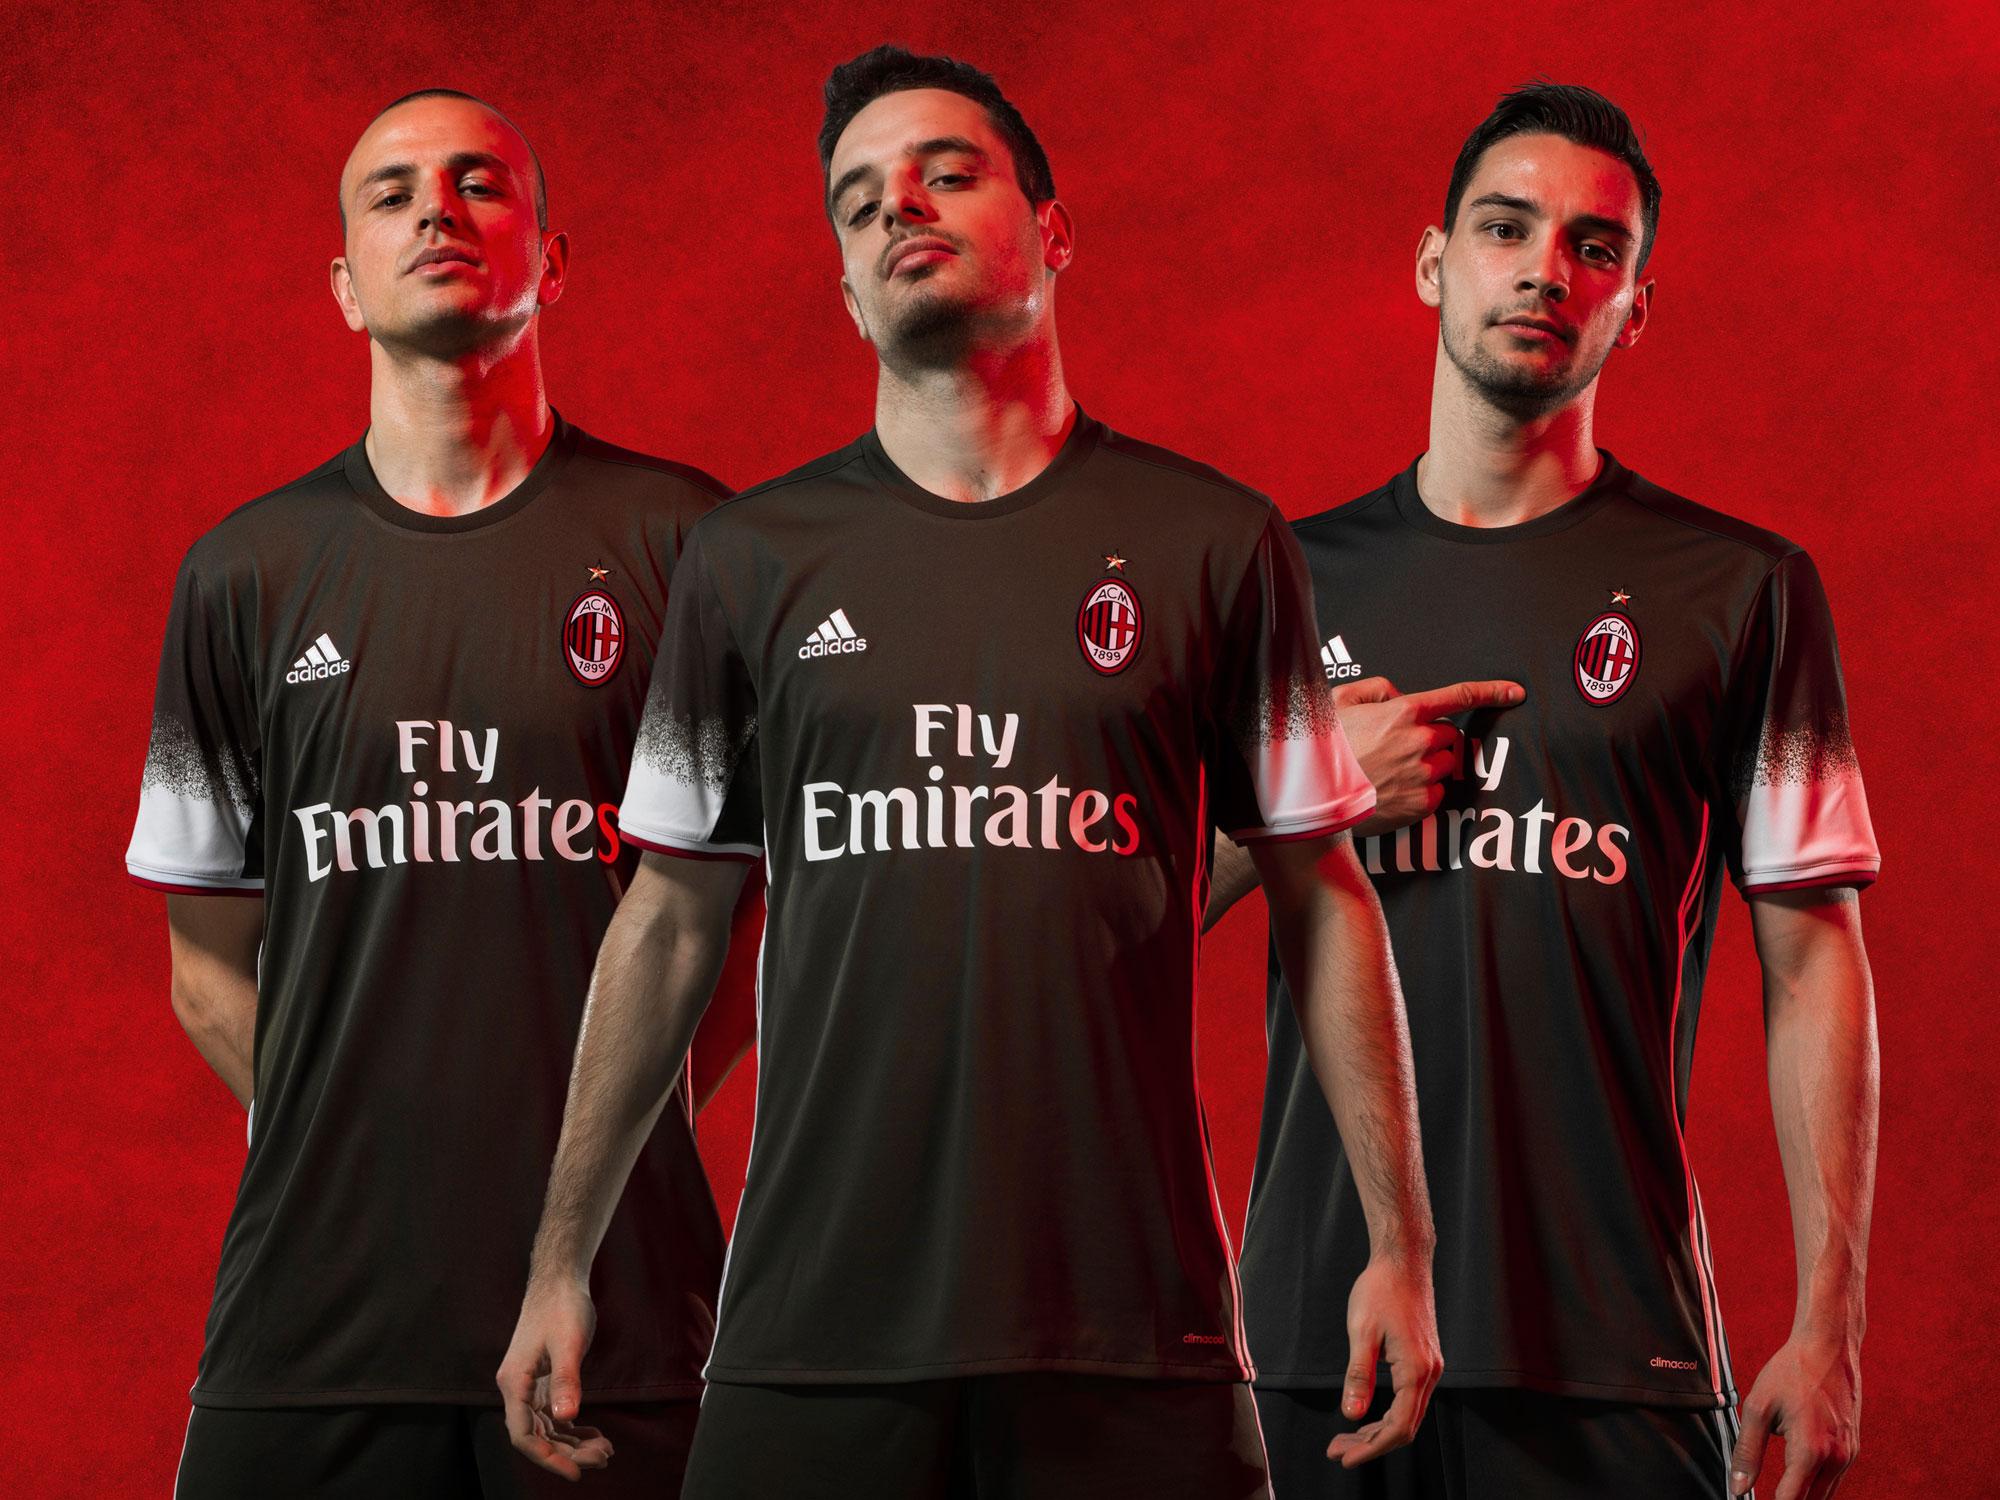 AC Milan's new third uniform